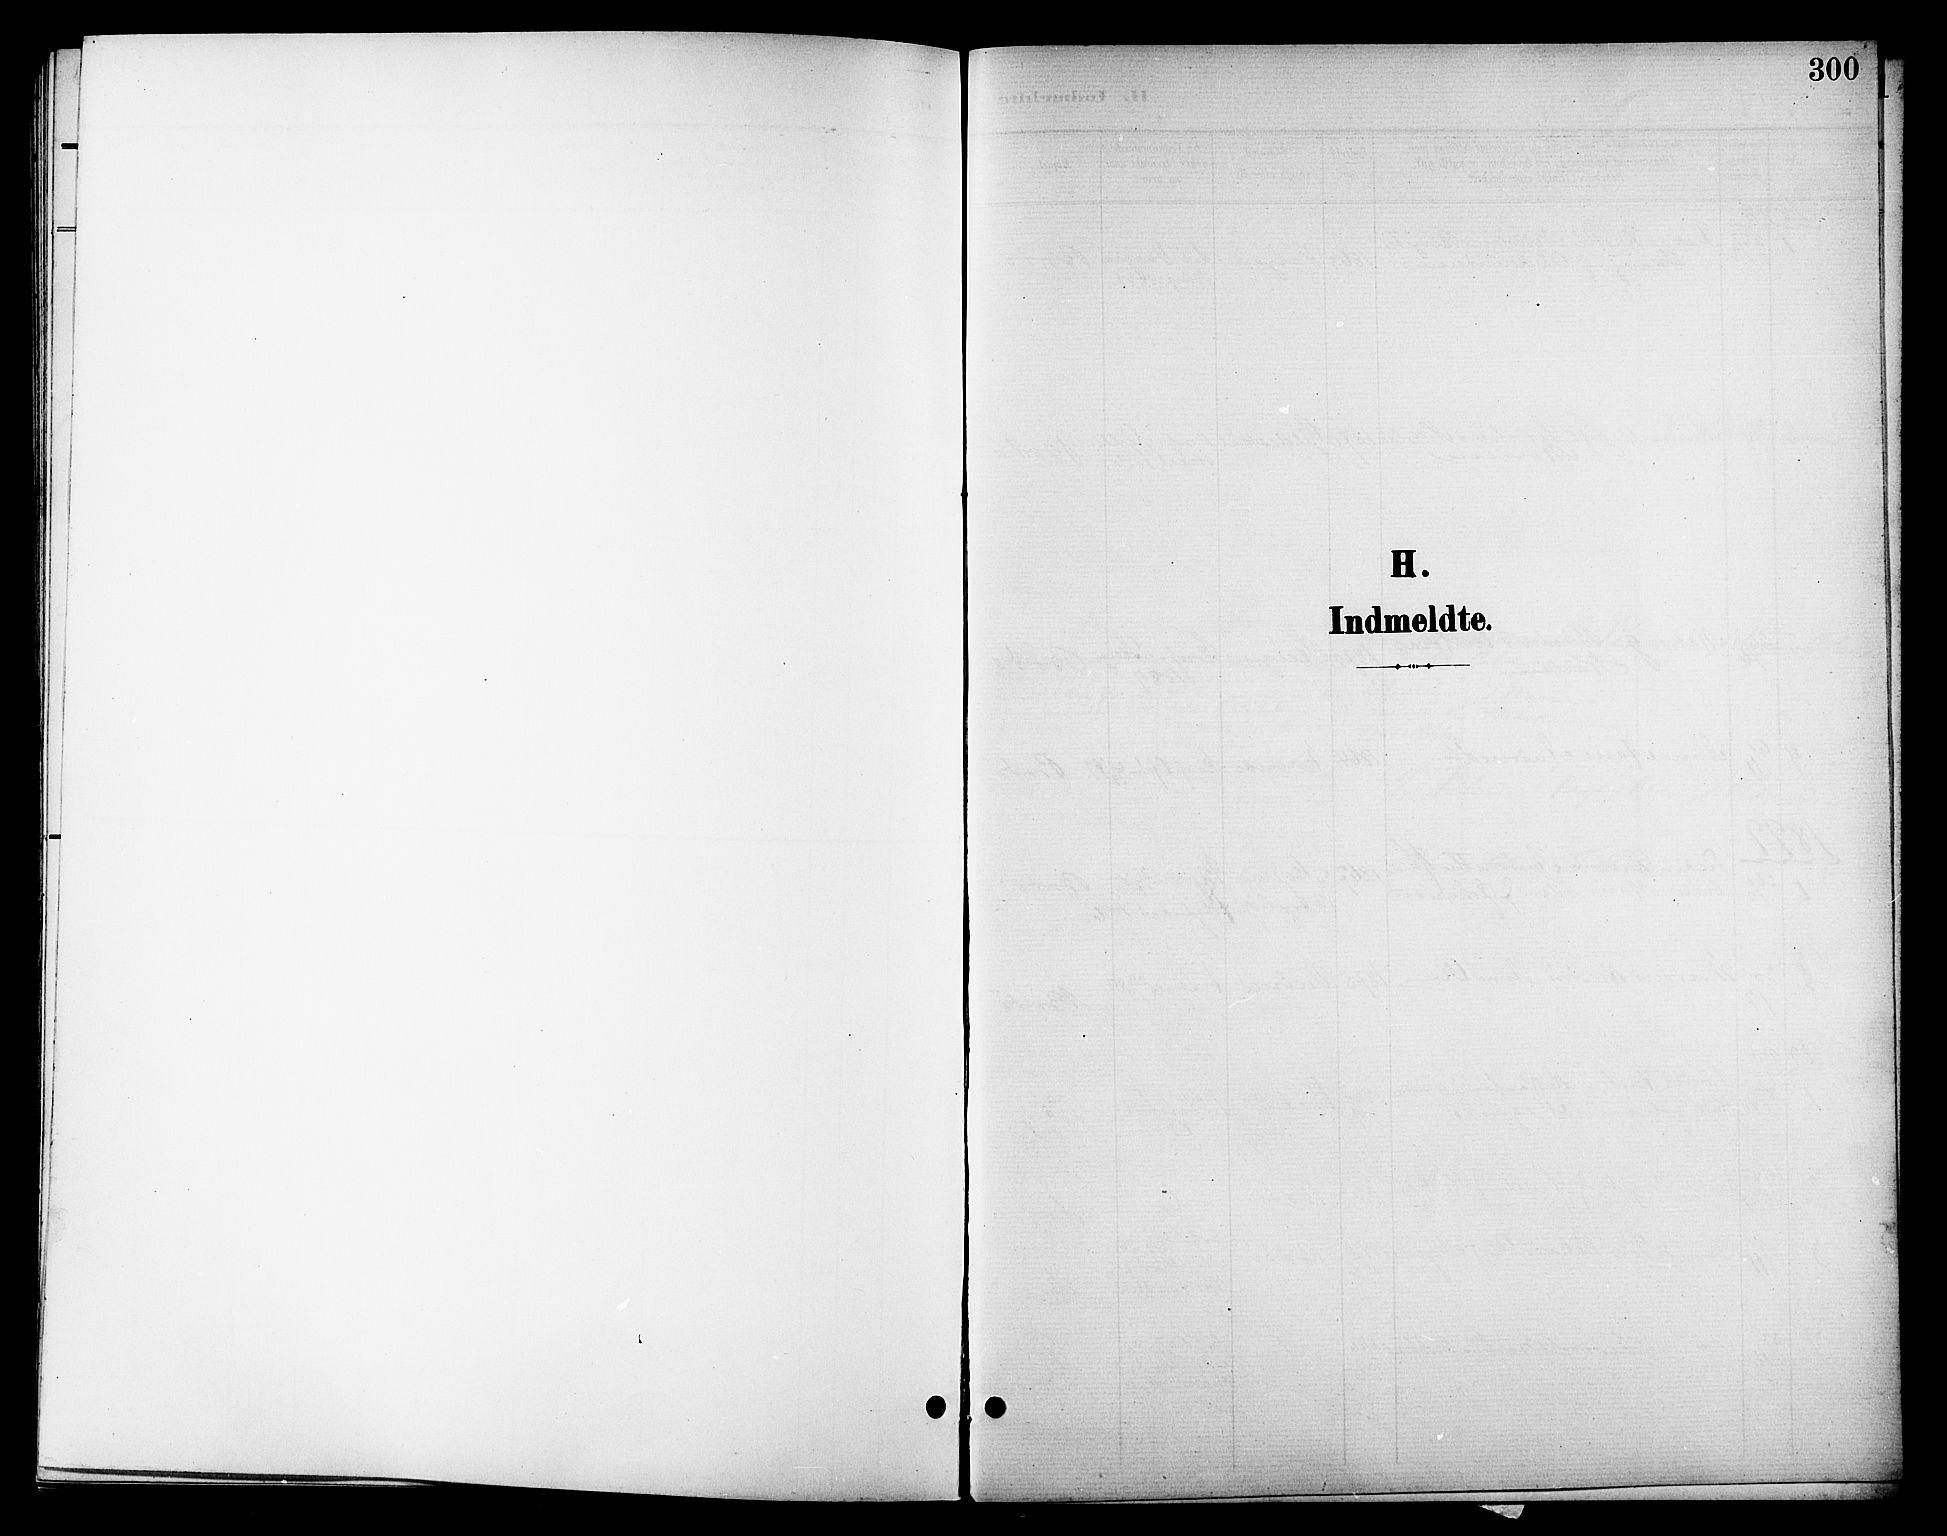 SAT, Ministerialprotokoller, klokkerbøker og fødselsregistre - Nordland, 801/L0033: Klokkerbok nr. 801C08, 1898-1910, s. 300